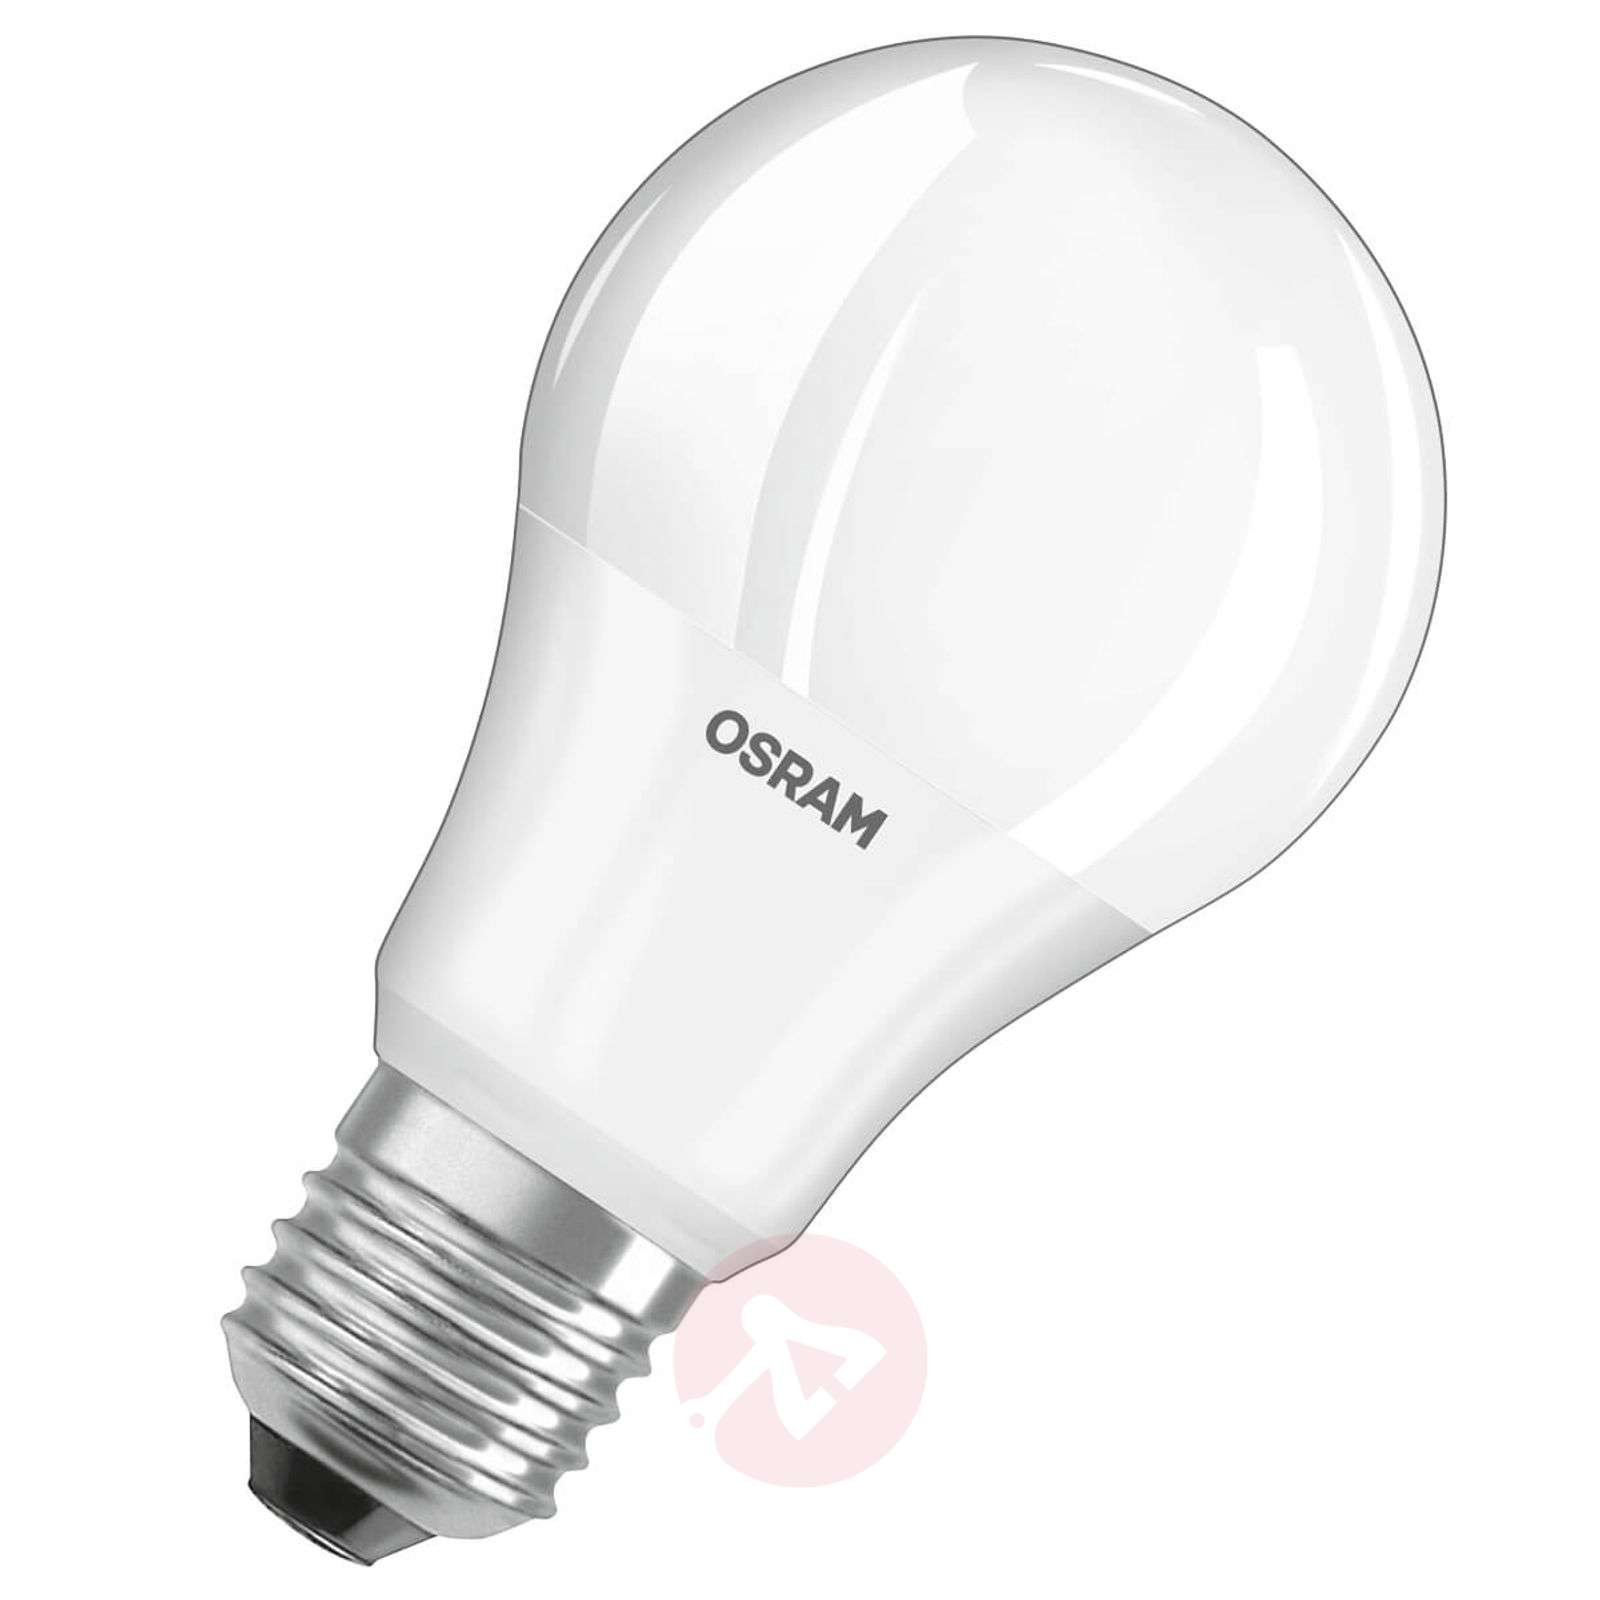 LED bulb E27 10.5 W, cool white, set of 3-7262106-01